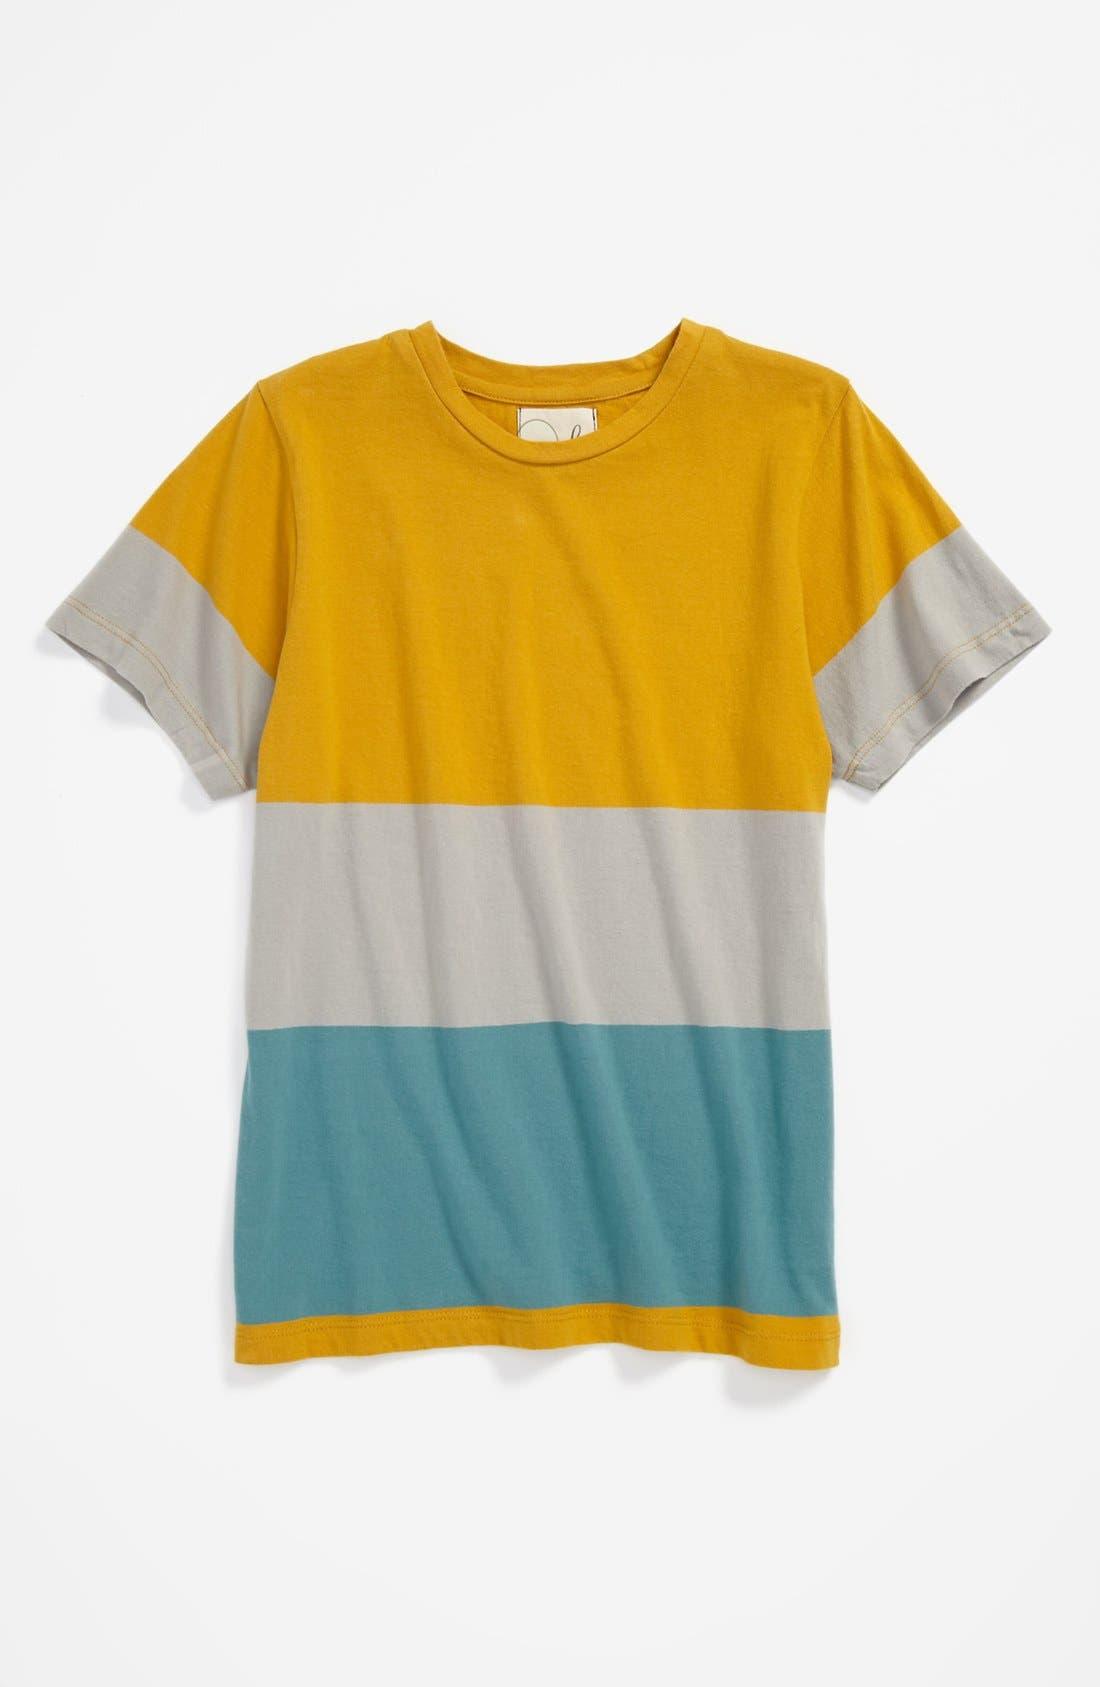 Main Image - Peek 'Elliot' T-Shirt (Toddler Boys, Little Boys & Big Boys)